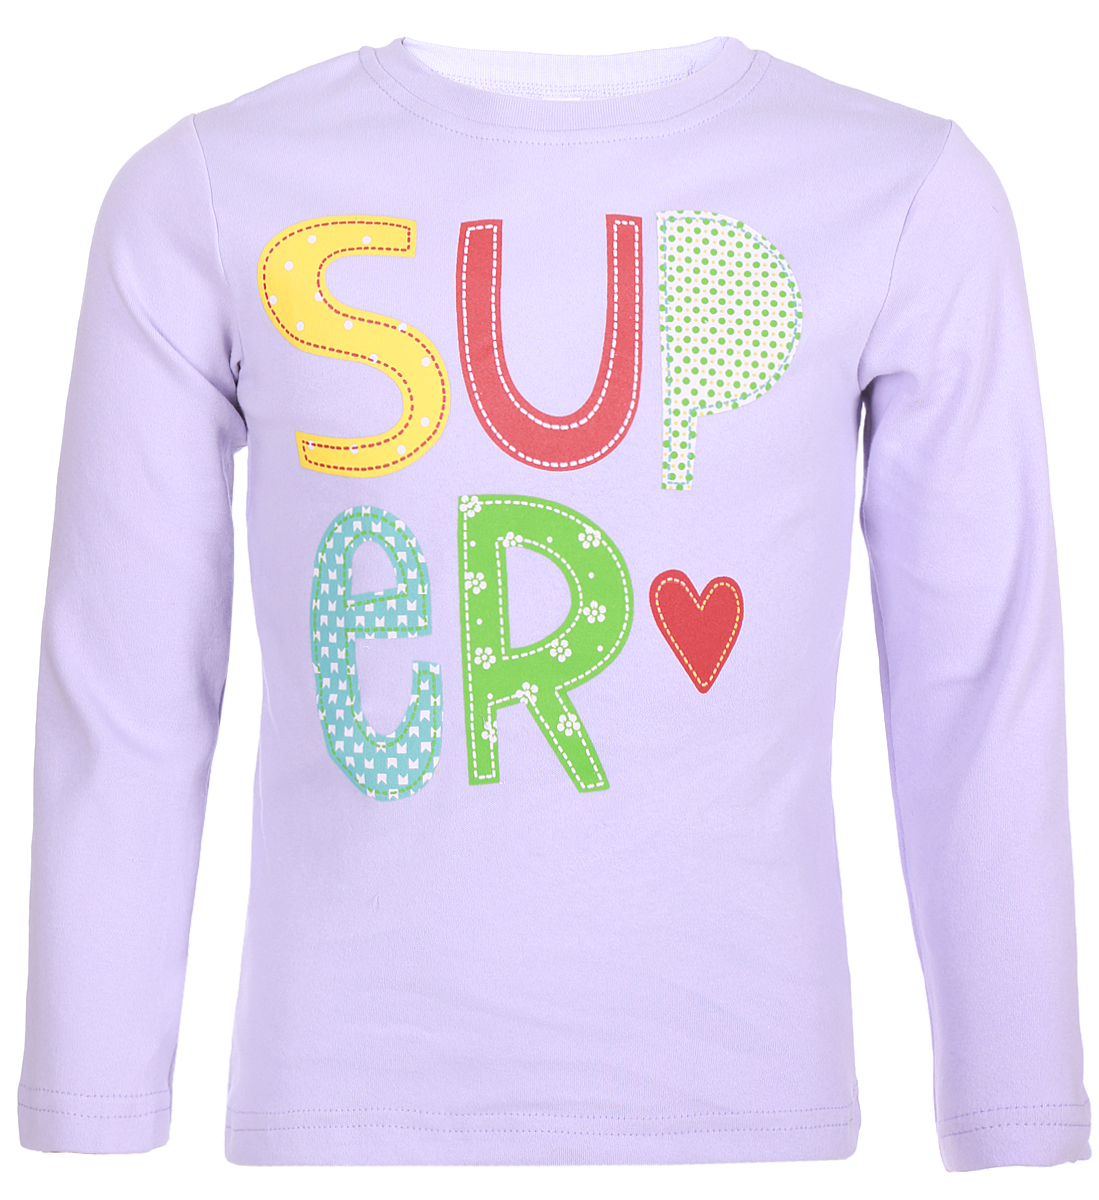 Джемпер для девочки Arge Fashion, цвет: фиолетовый. MRM-15B-42-12. Размер 122MRM-15B-42-12